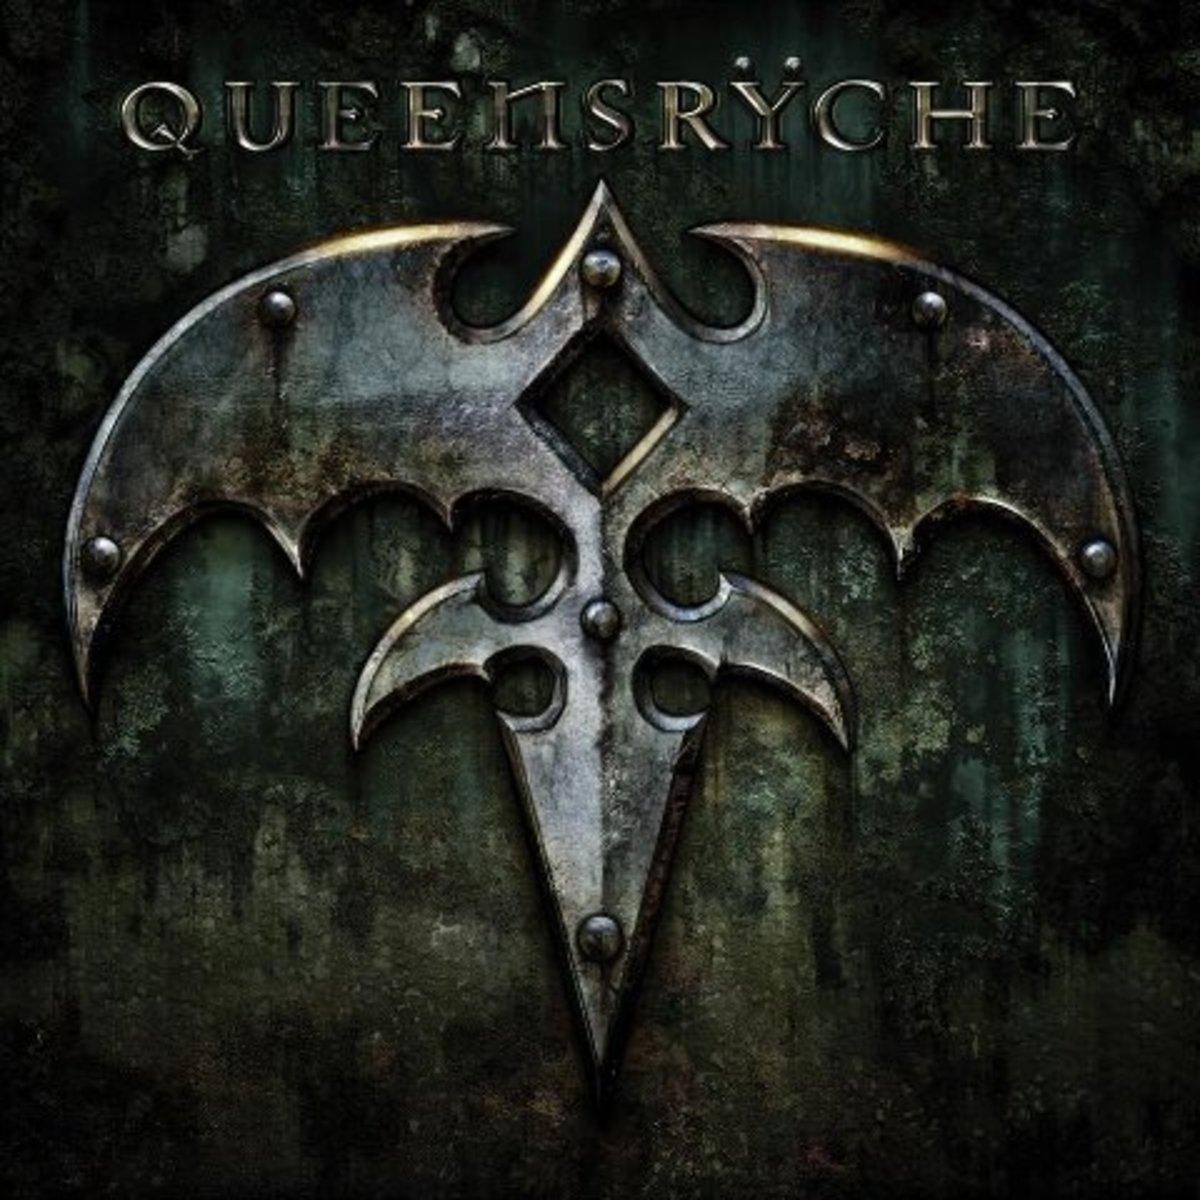 """Queensrÿche"" self titled album cover"